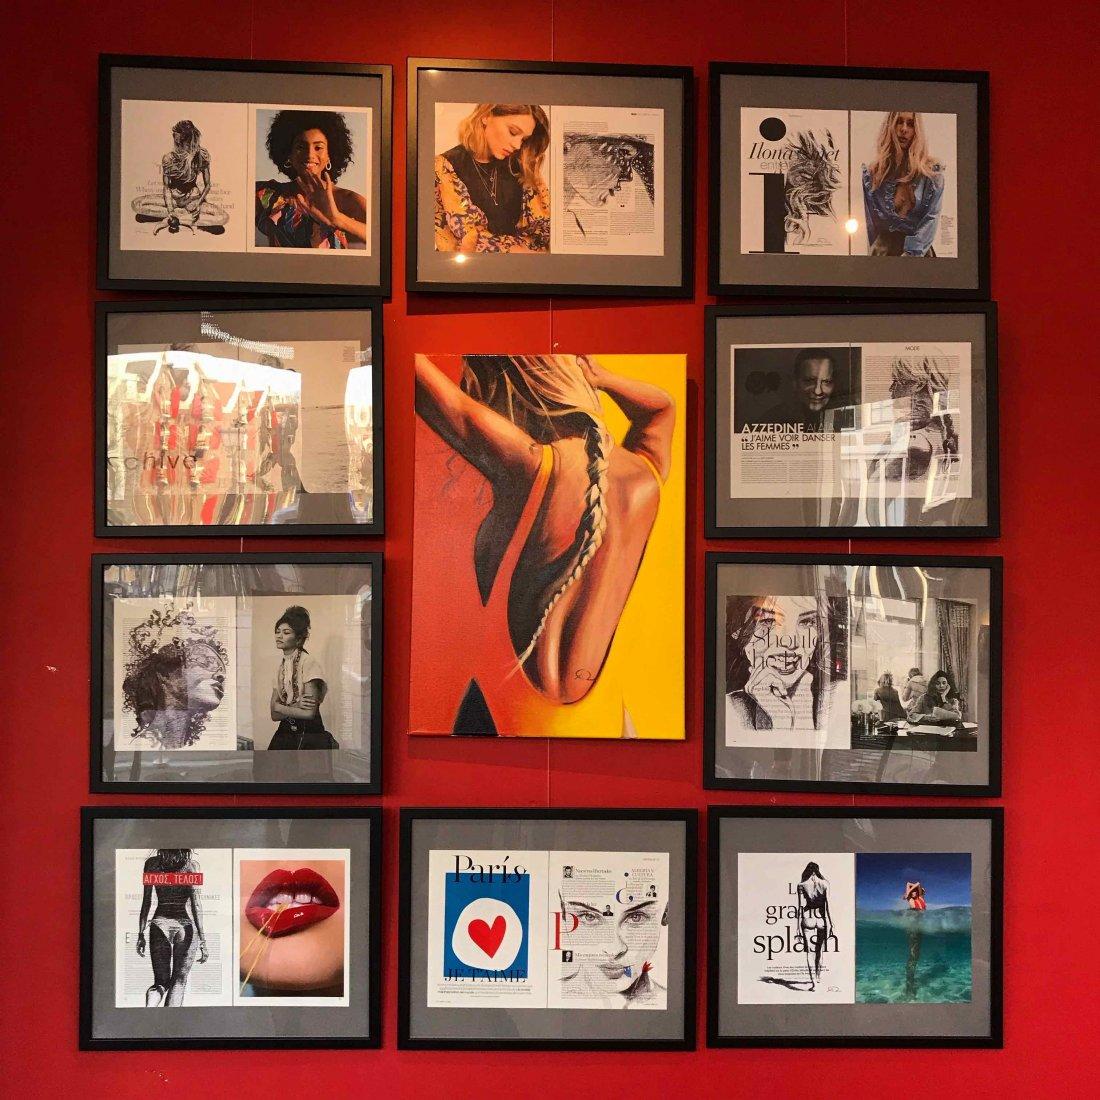 opening-amsterdam-exhibition-antoinerenault-art-18